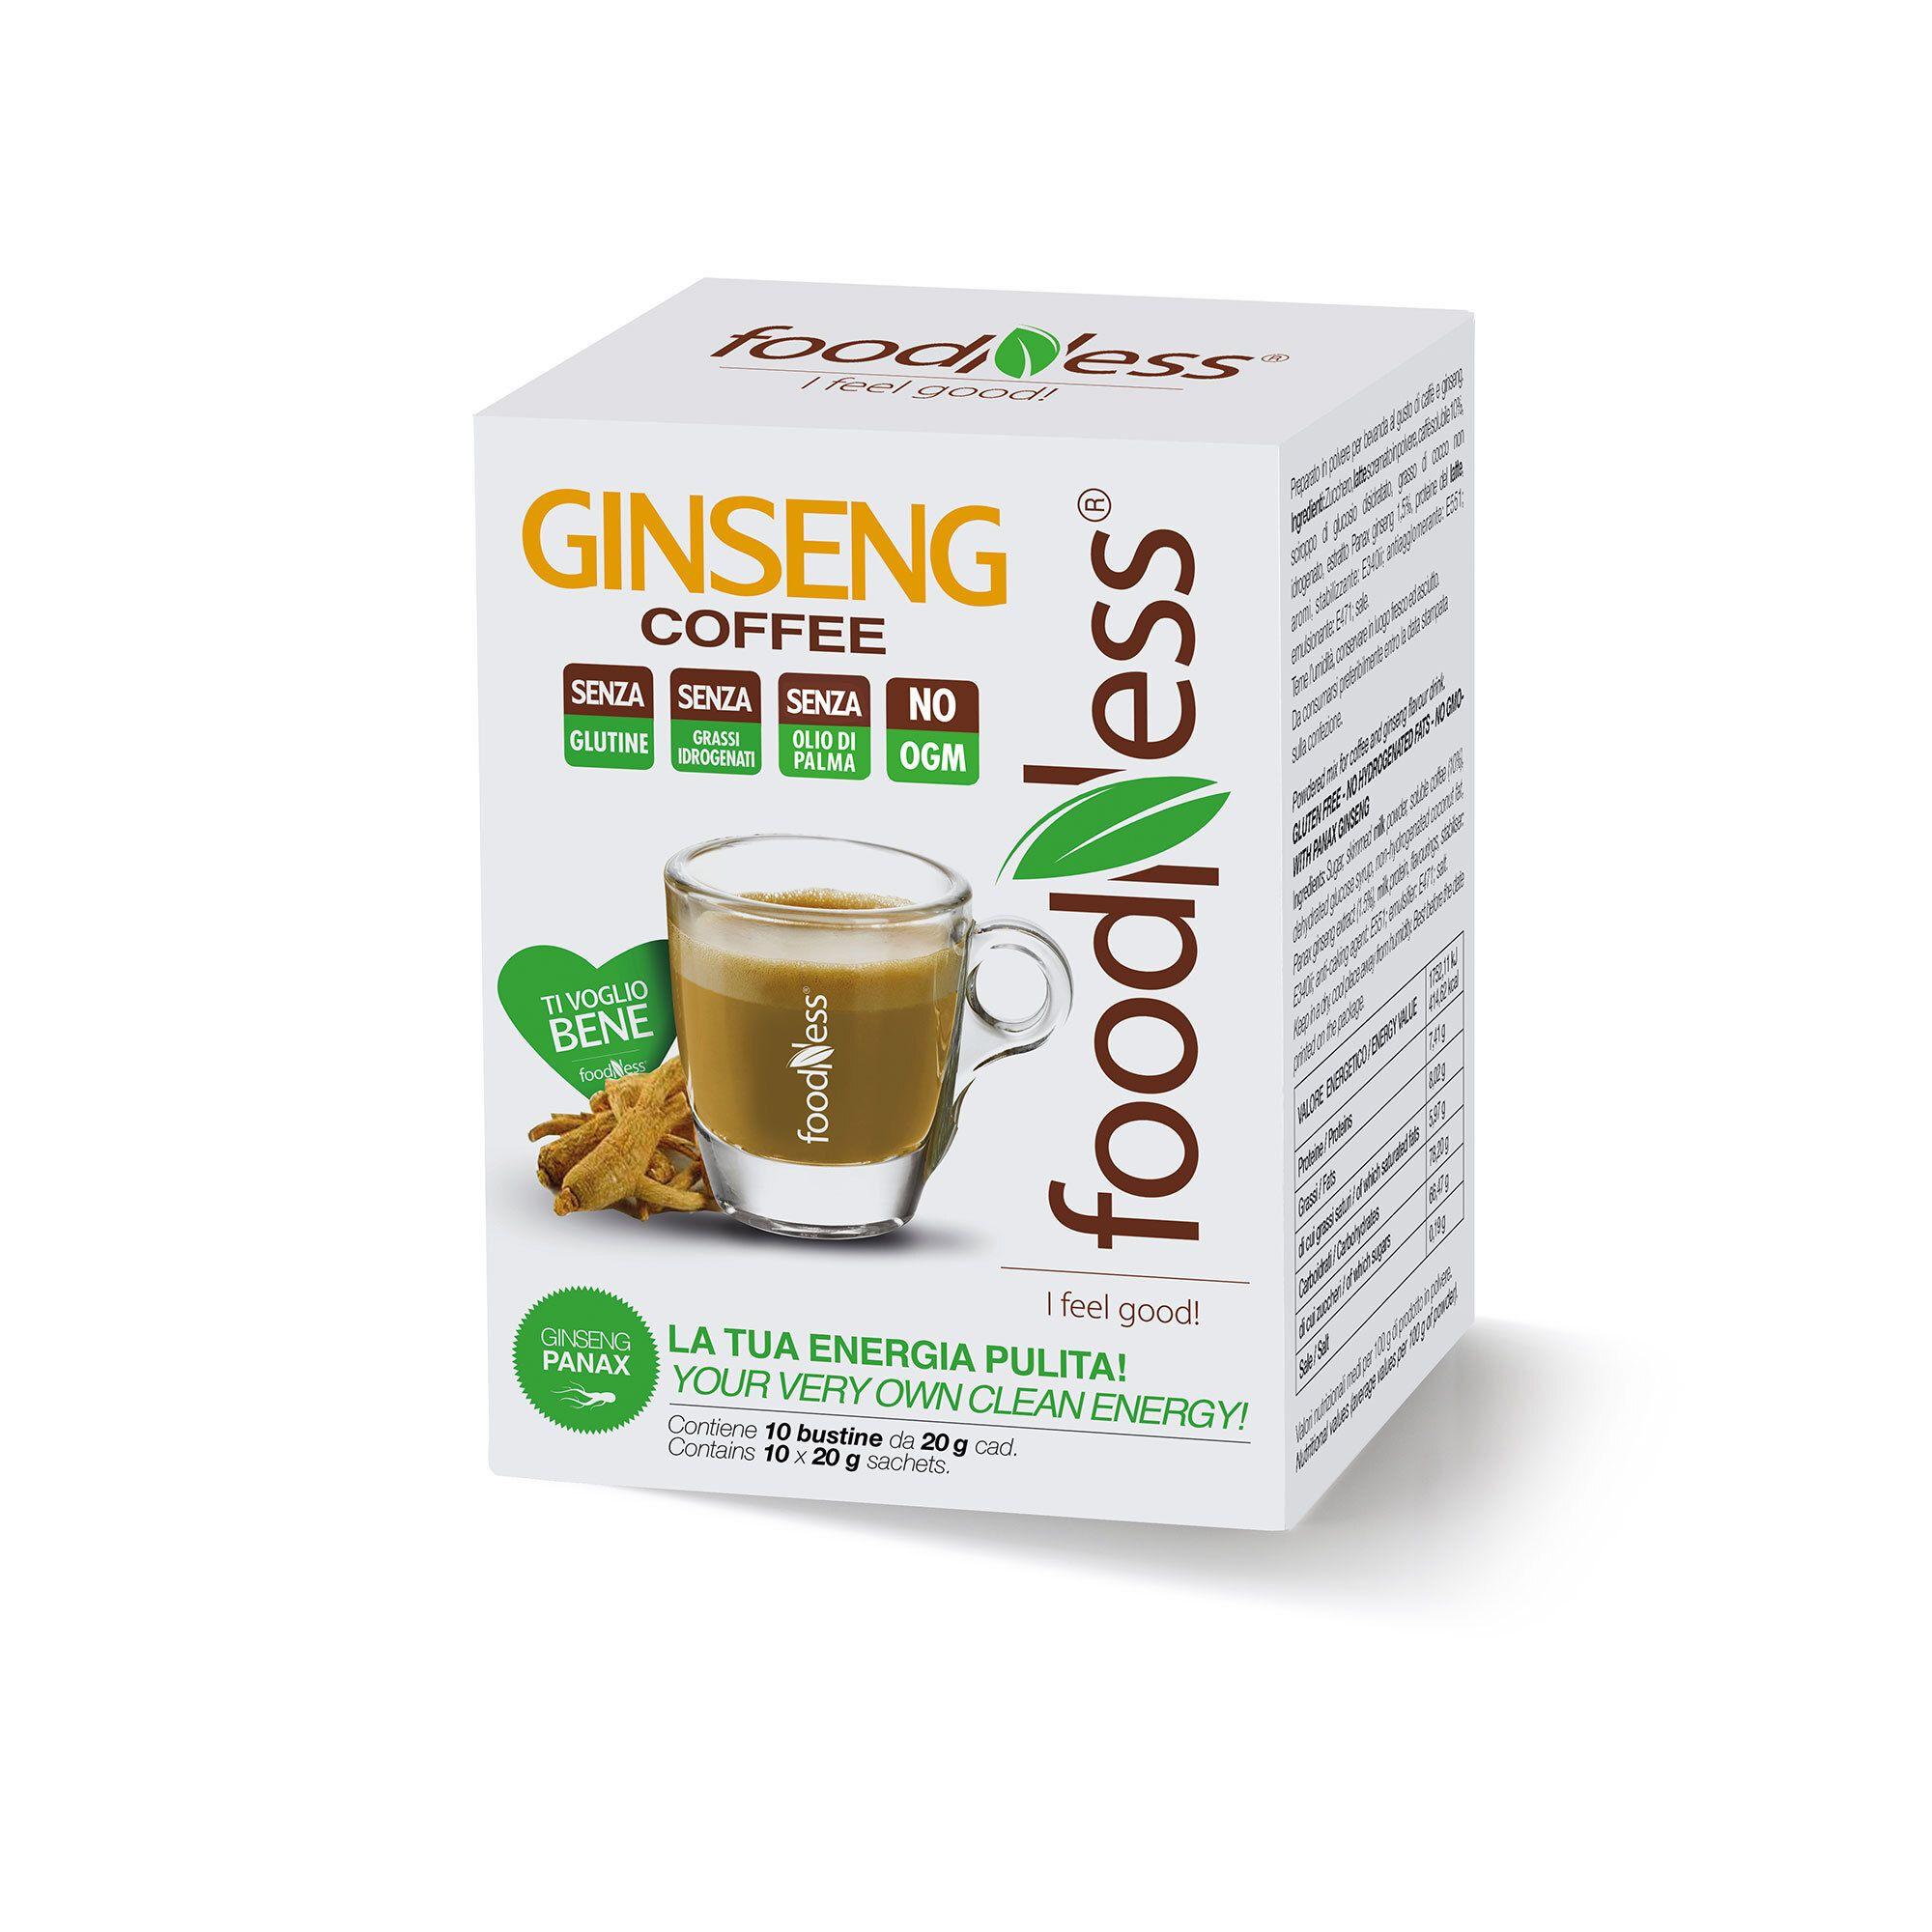 Set 3 box con Ginseng coffee o Golden Milk curcuma